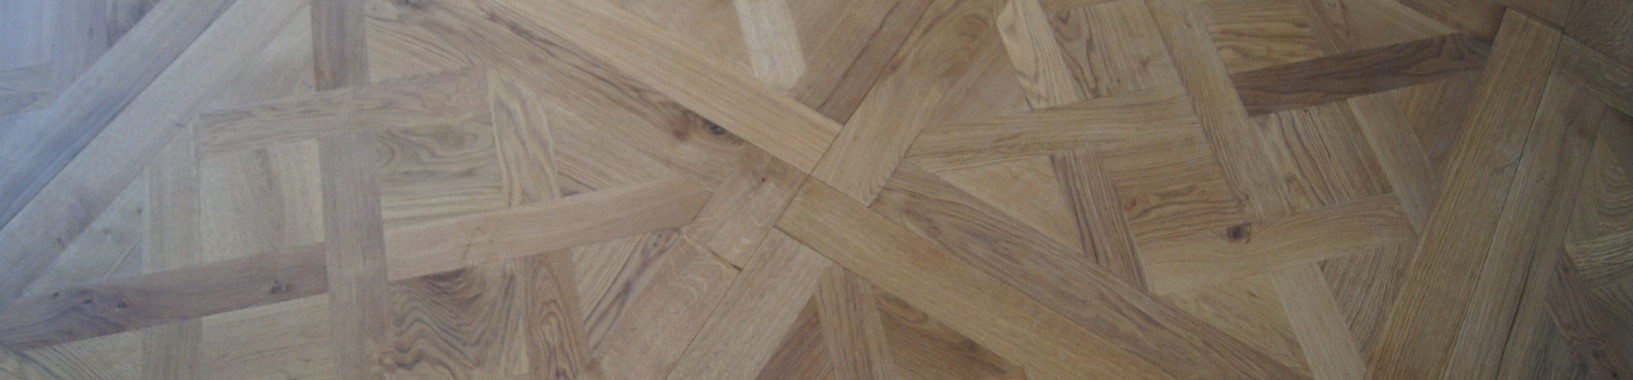 Luxurious Timber Panels